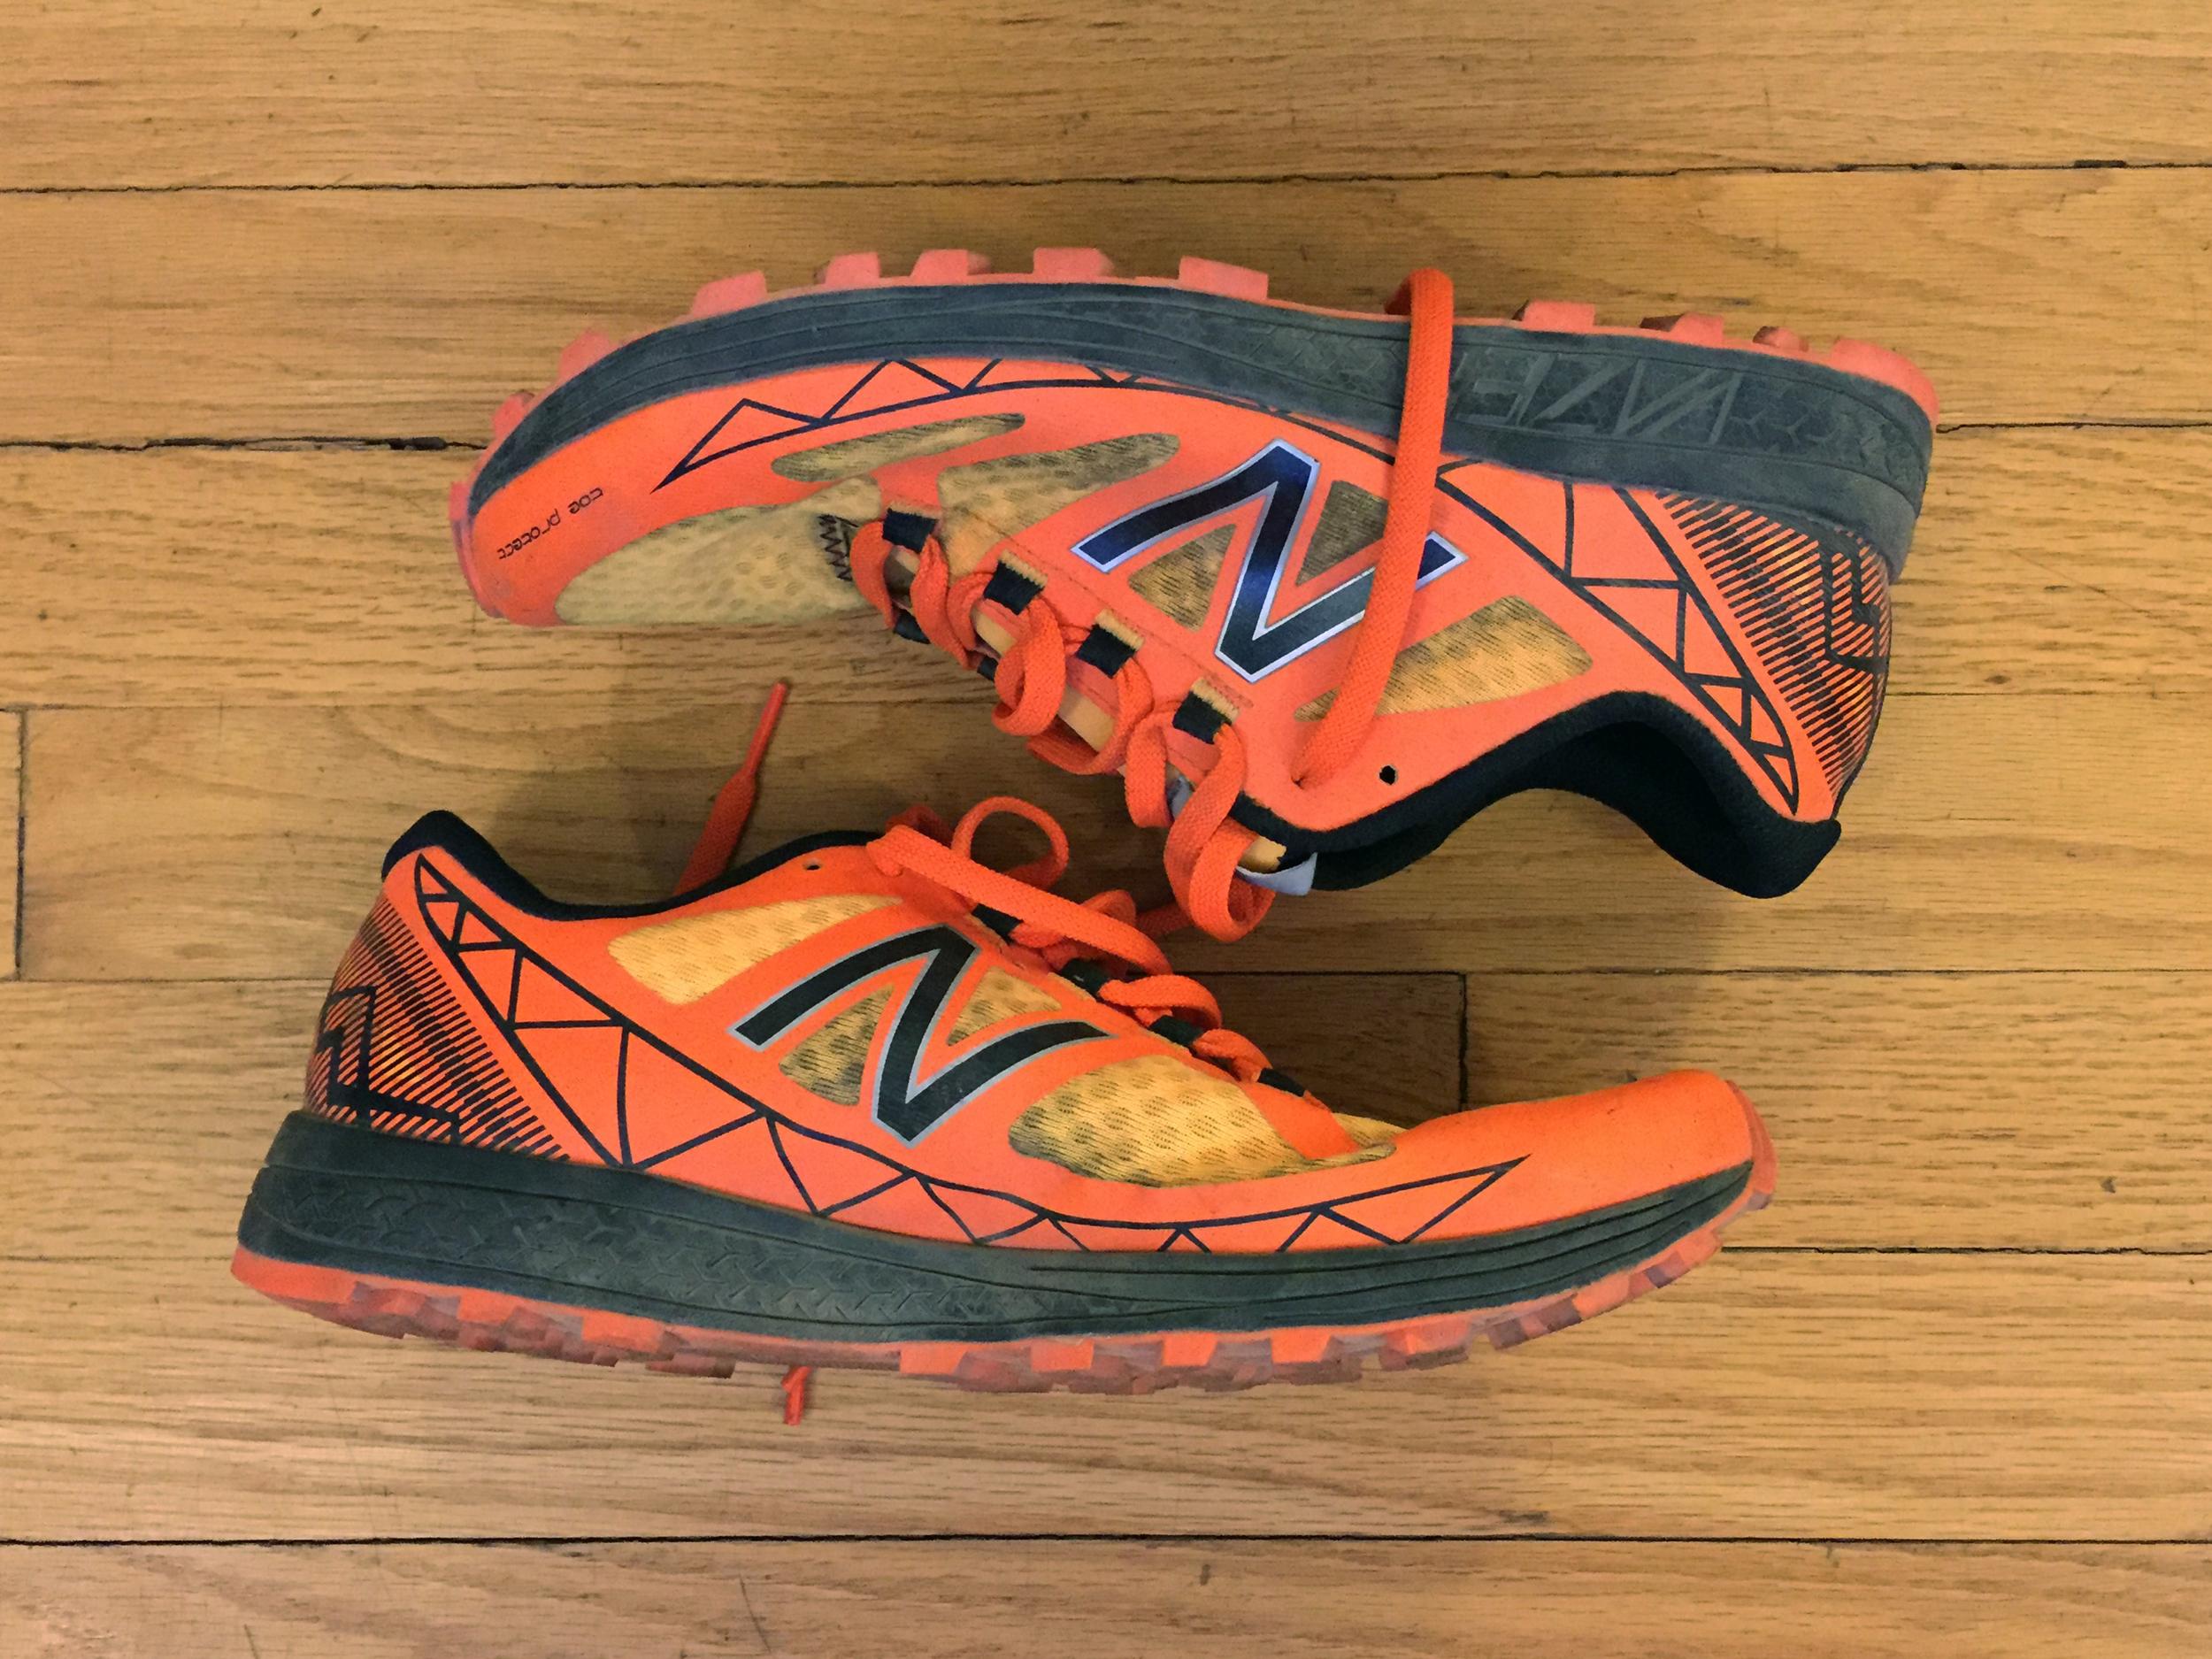 New Balance Vazee Summit Trail Shoes